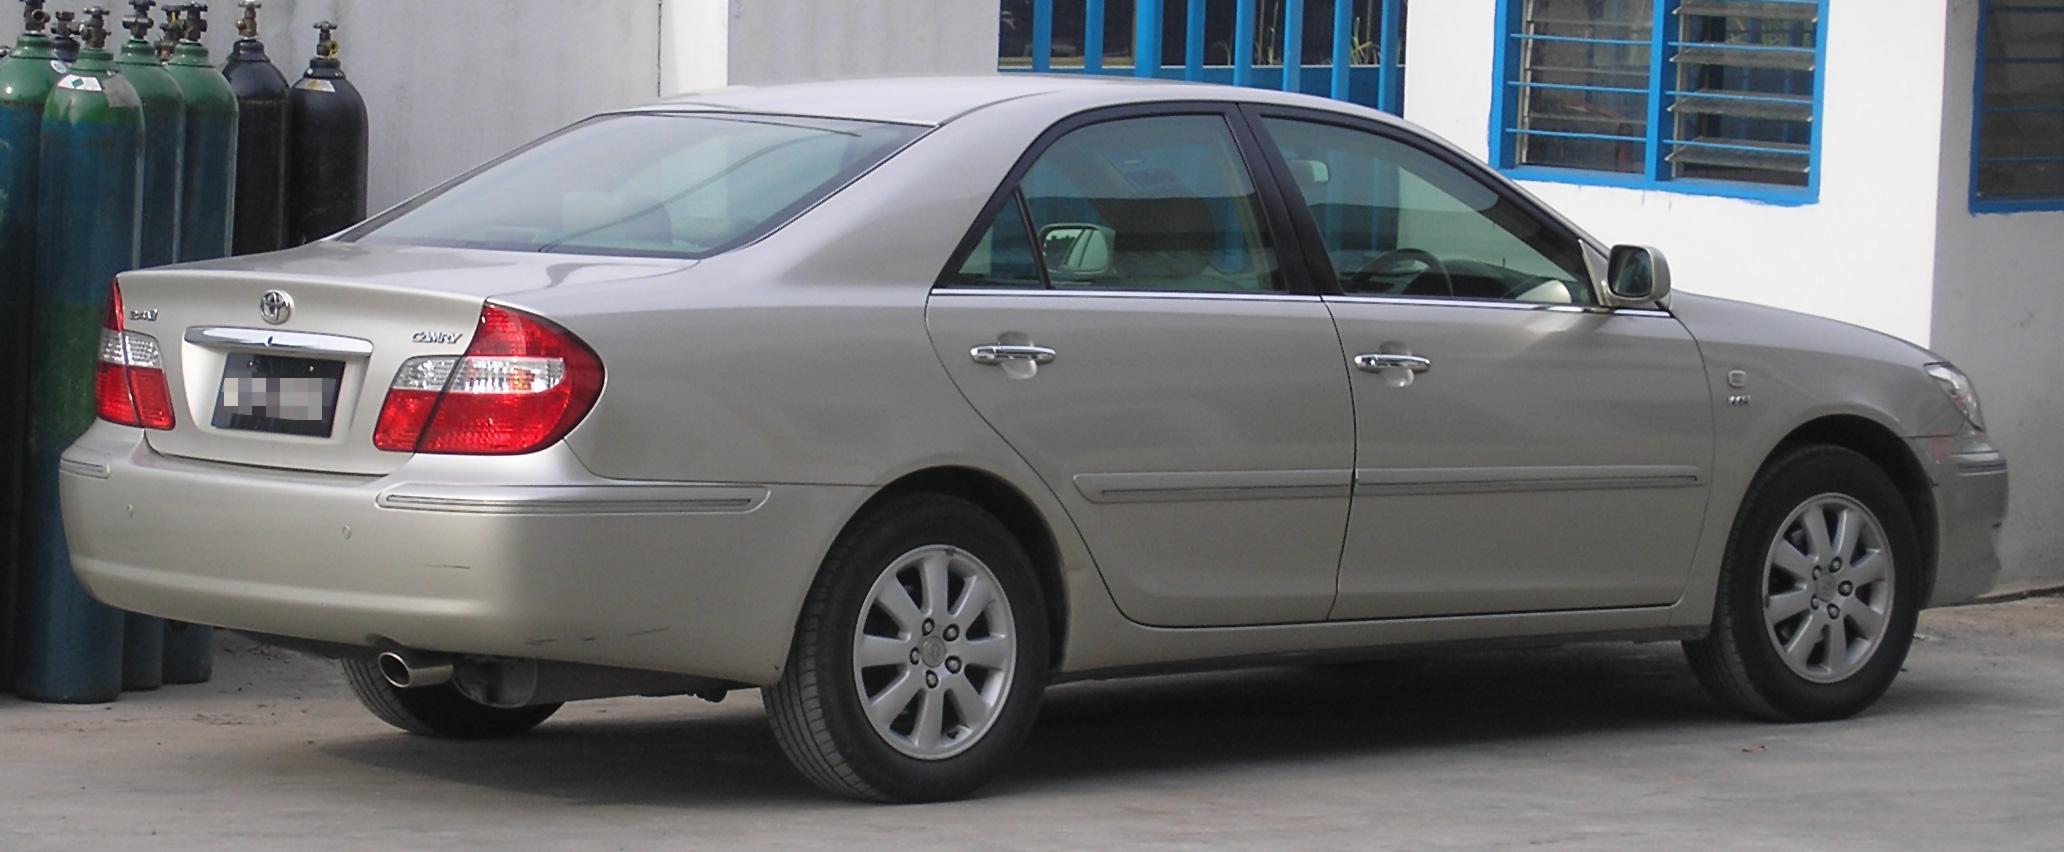 File Toyota Camry Fifth Generation Rear Kuala Lumpur